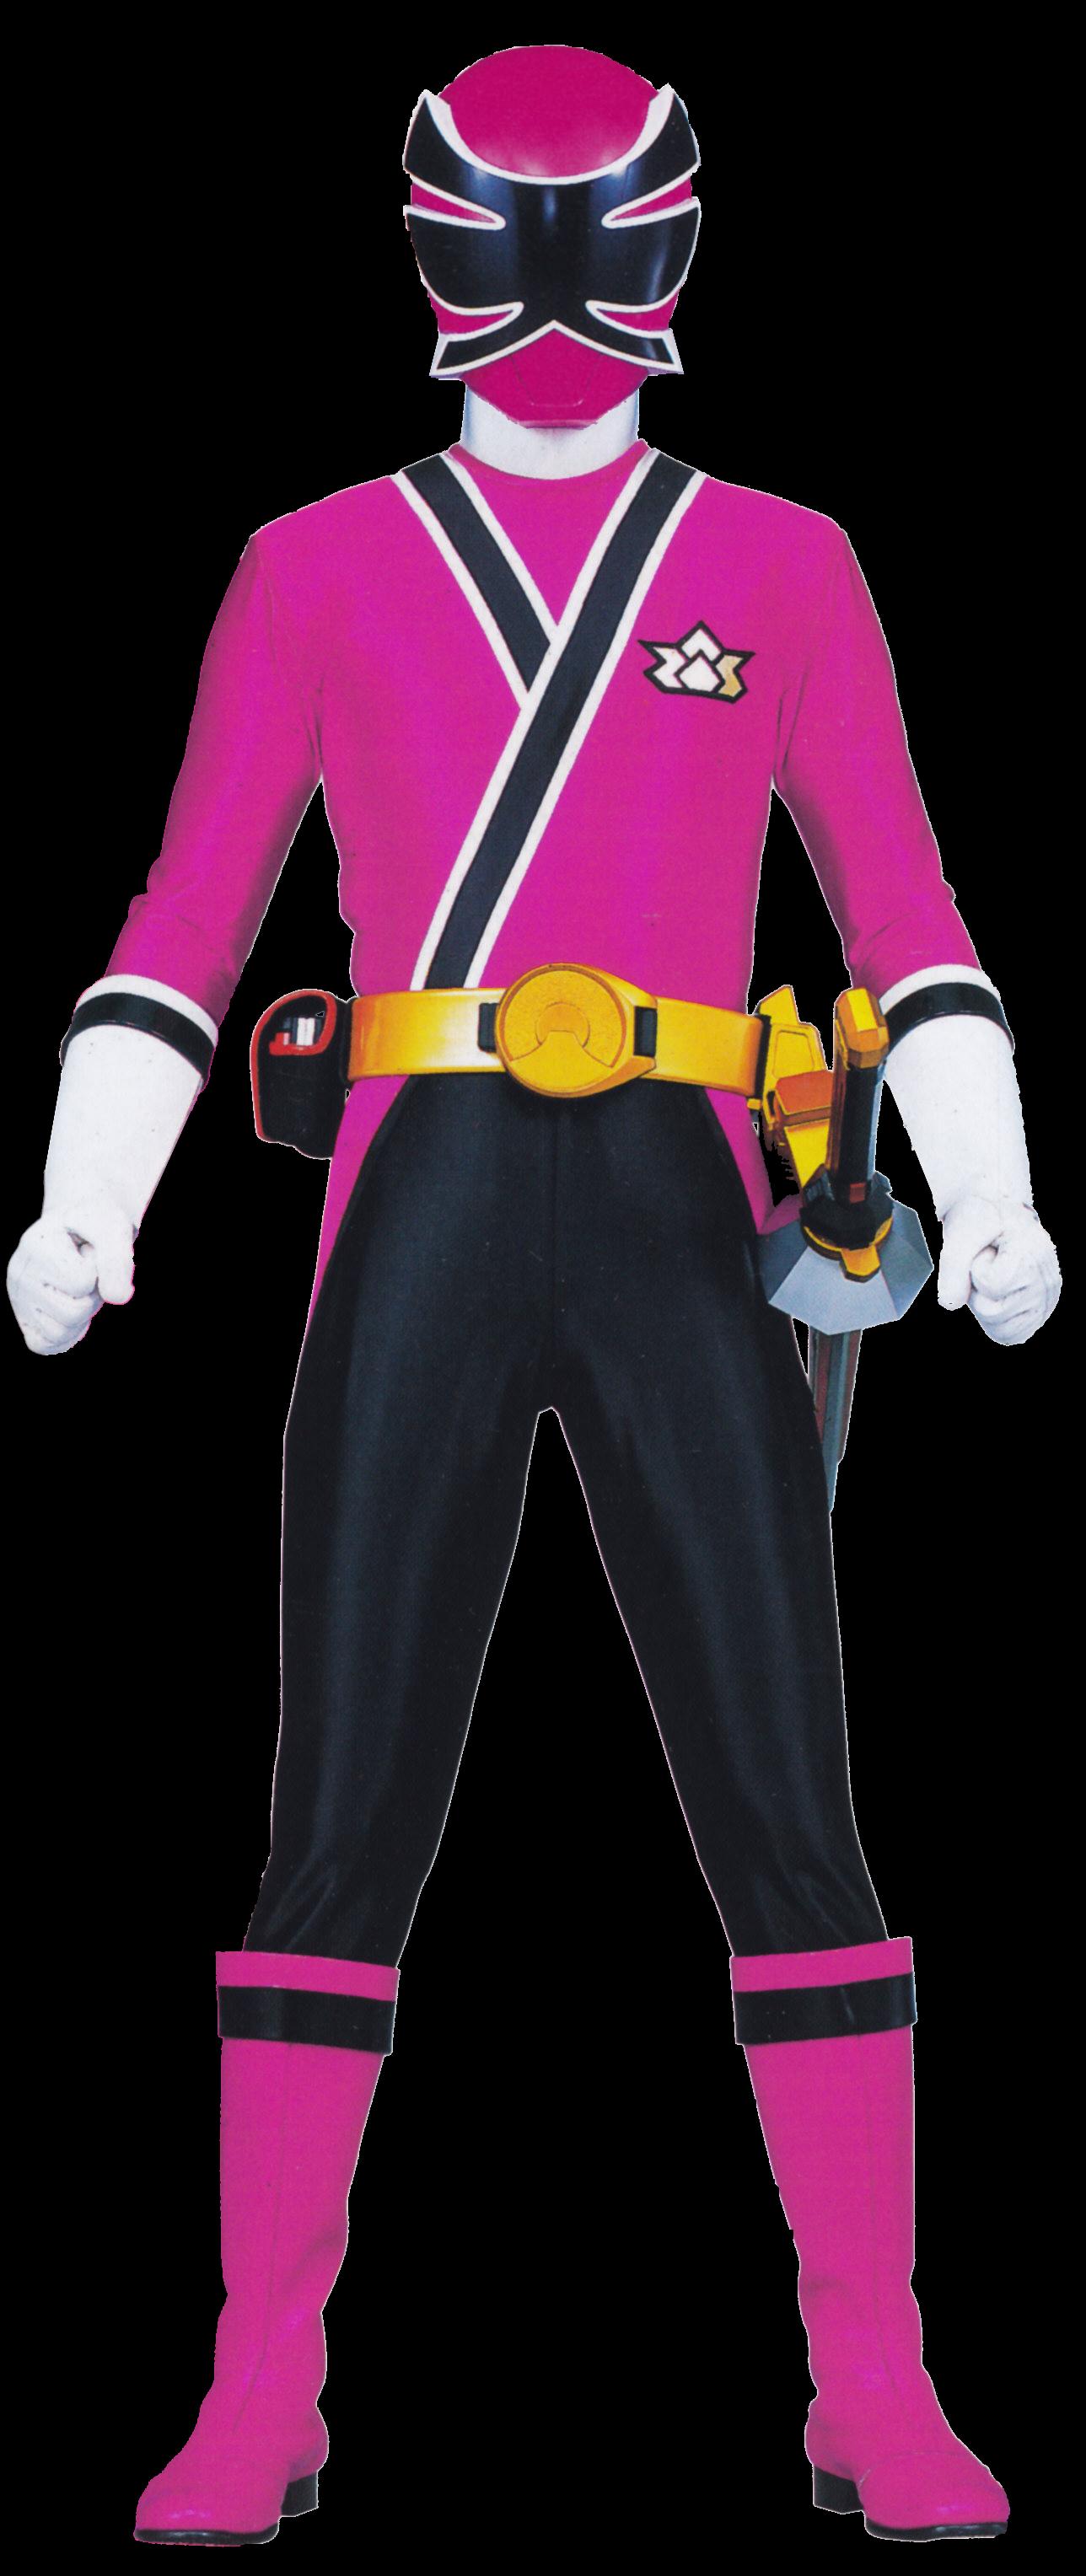 Pink clipart power ranger Samurai Ranger Ranger Samurai Pink